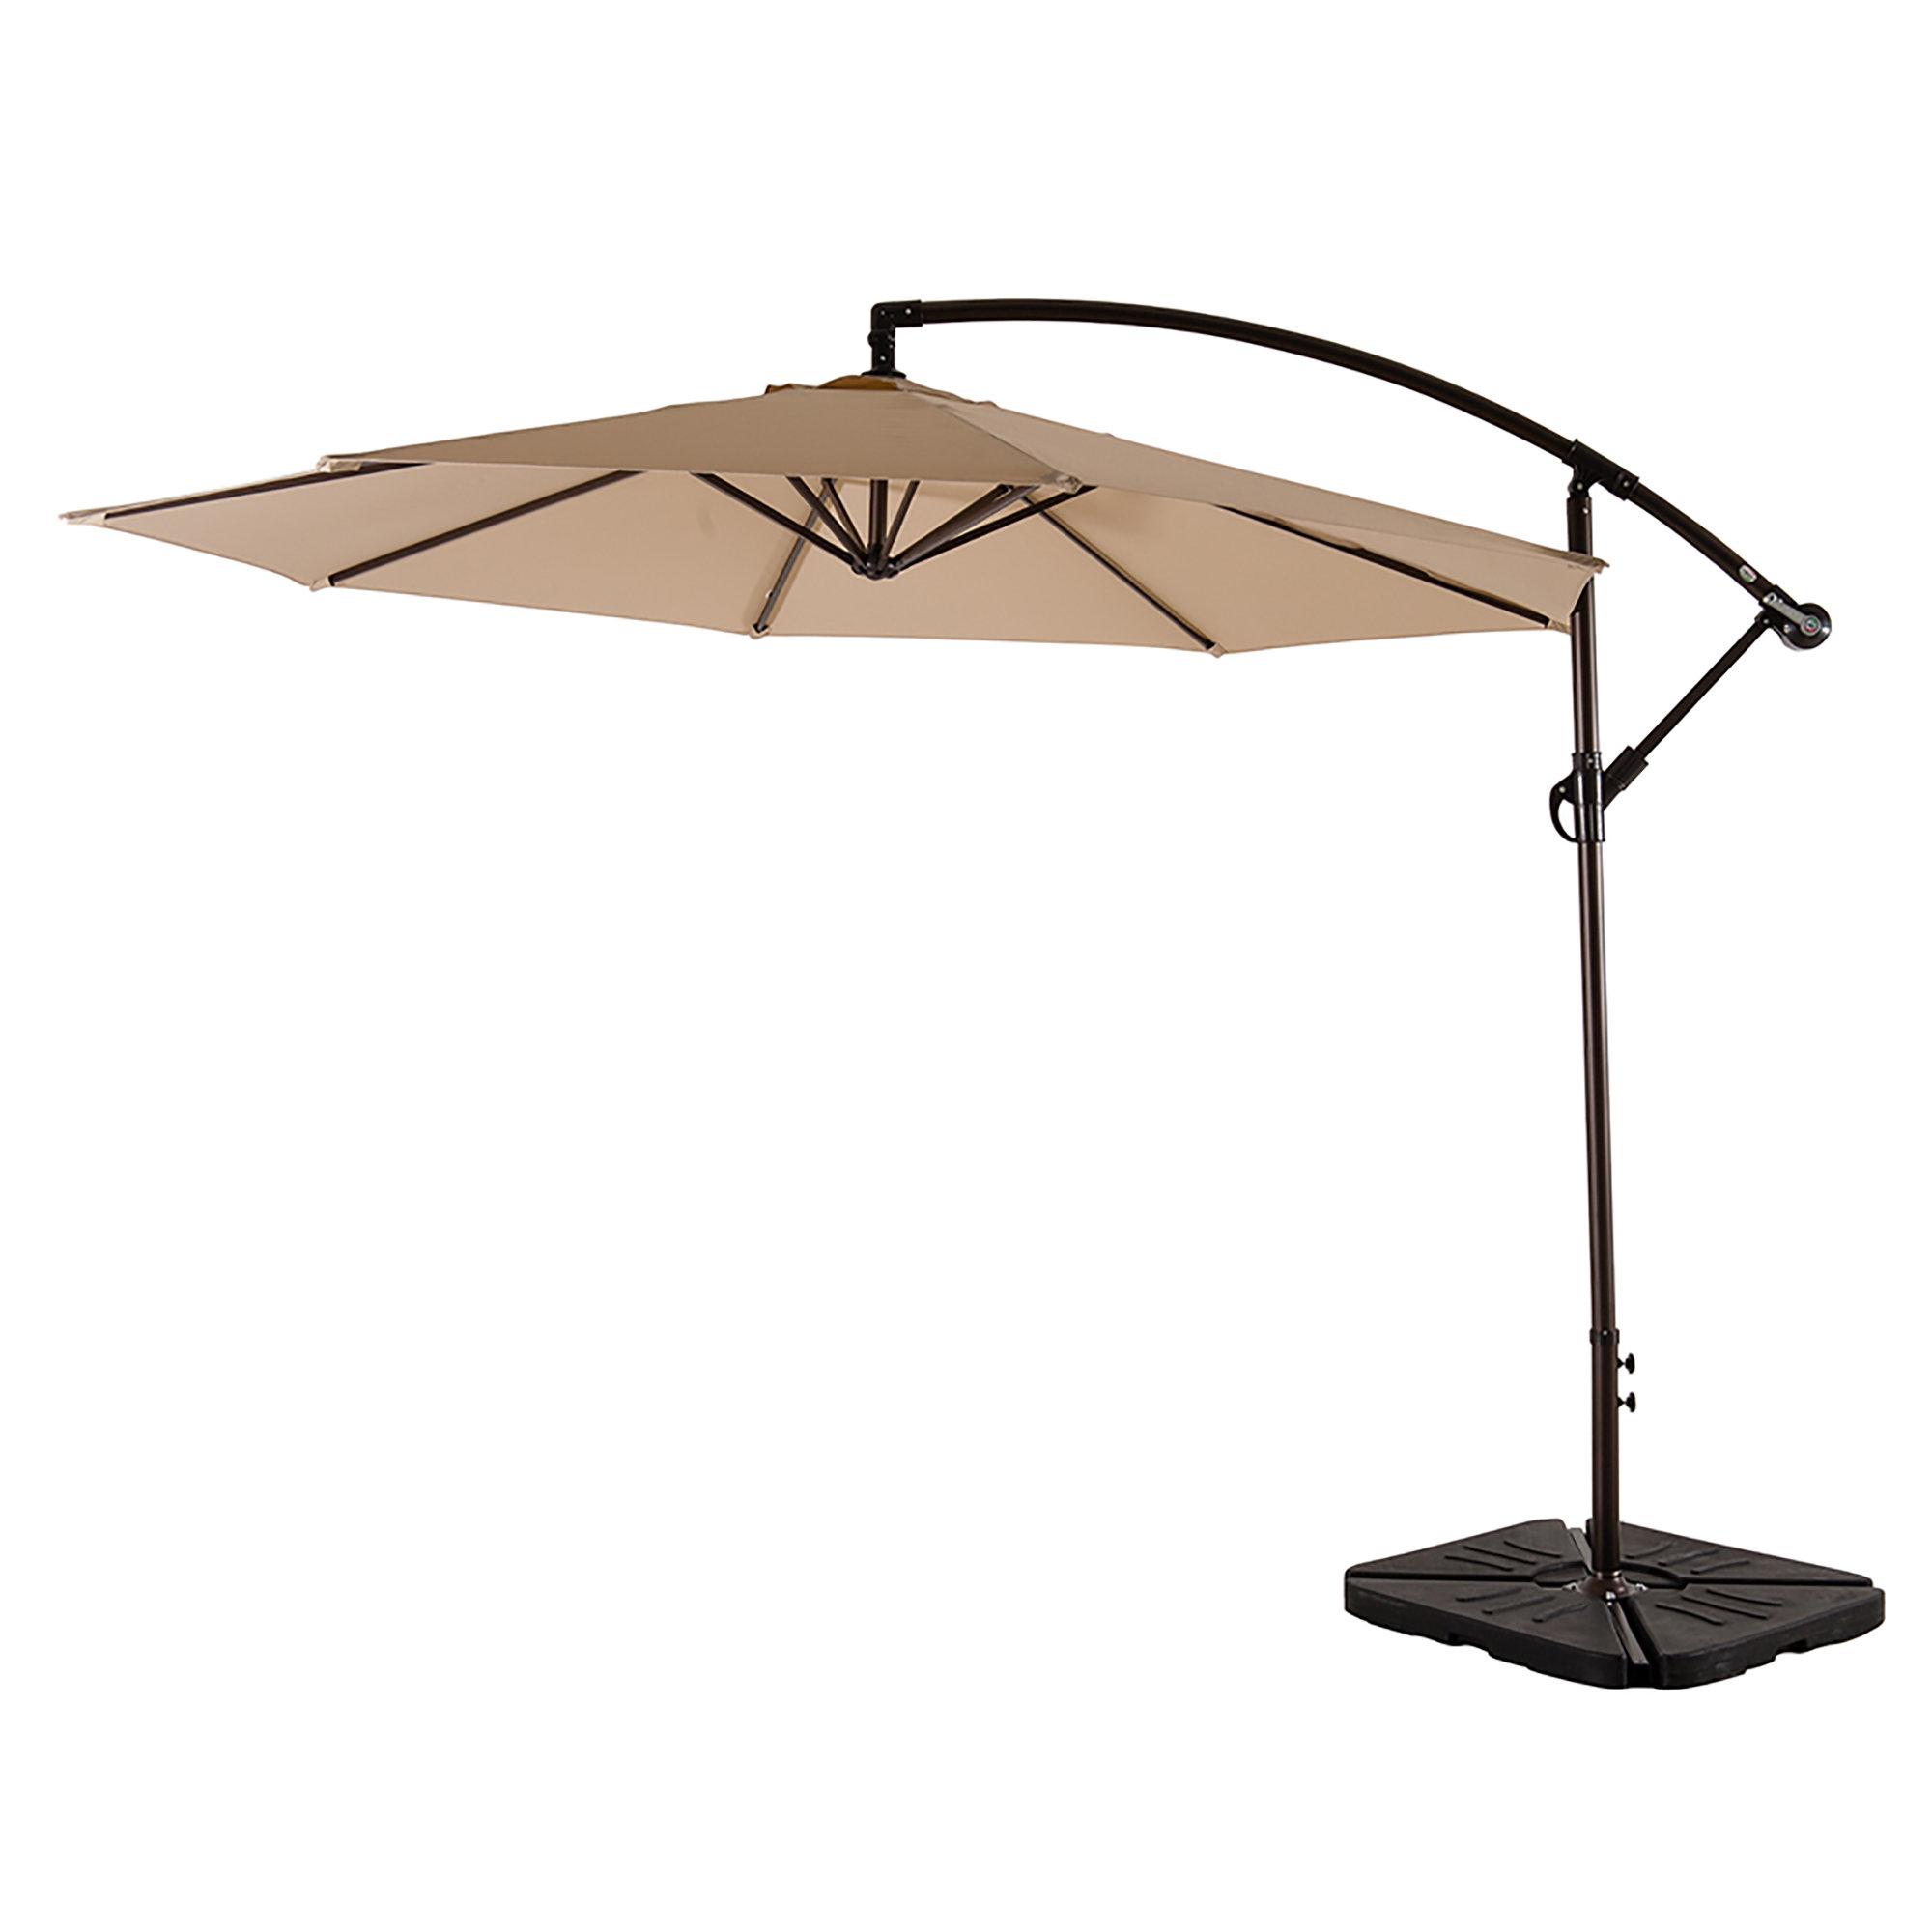 2020 Yajaira Cantilever Umbrellas Regarding Kizzie Market 10' Cantilever Umbrella (Gallery 2 of 20)